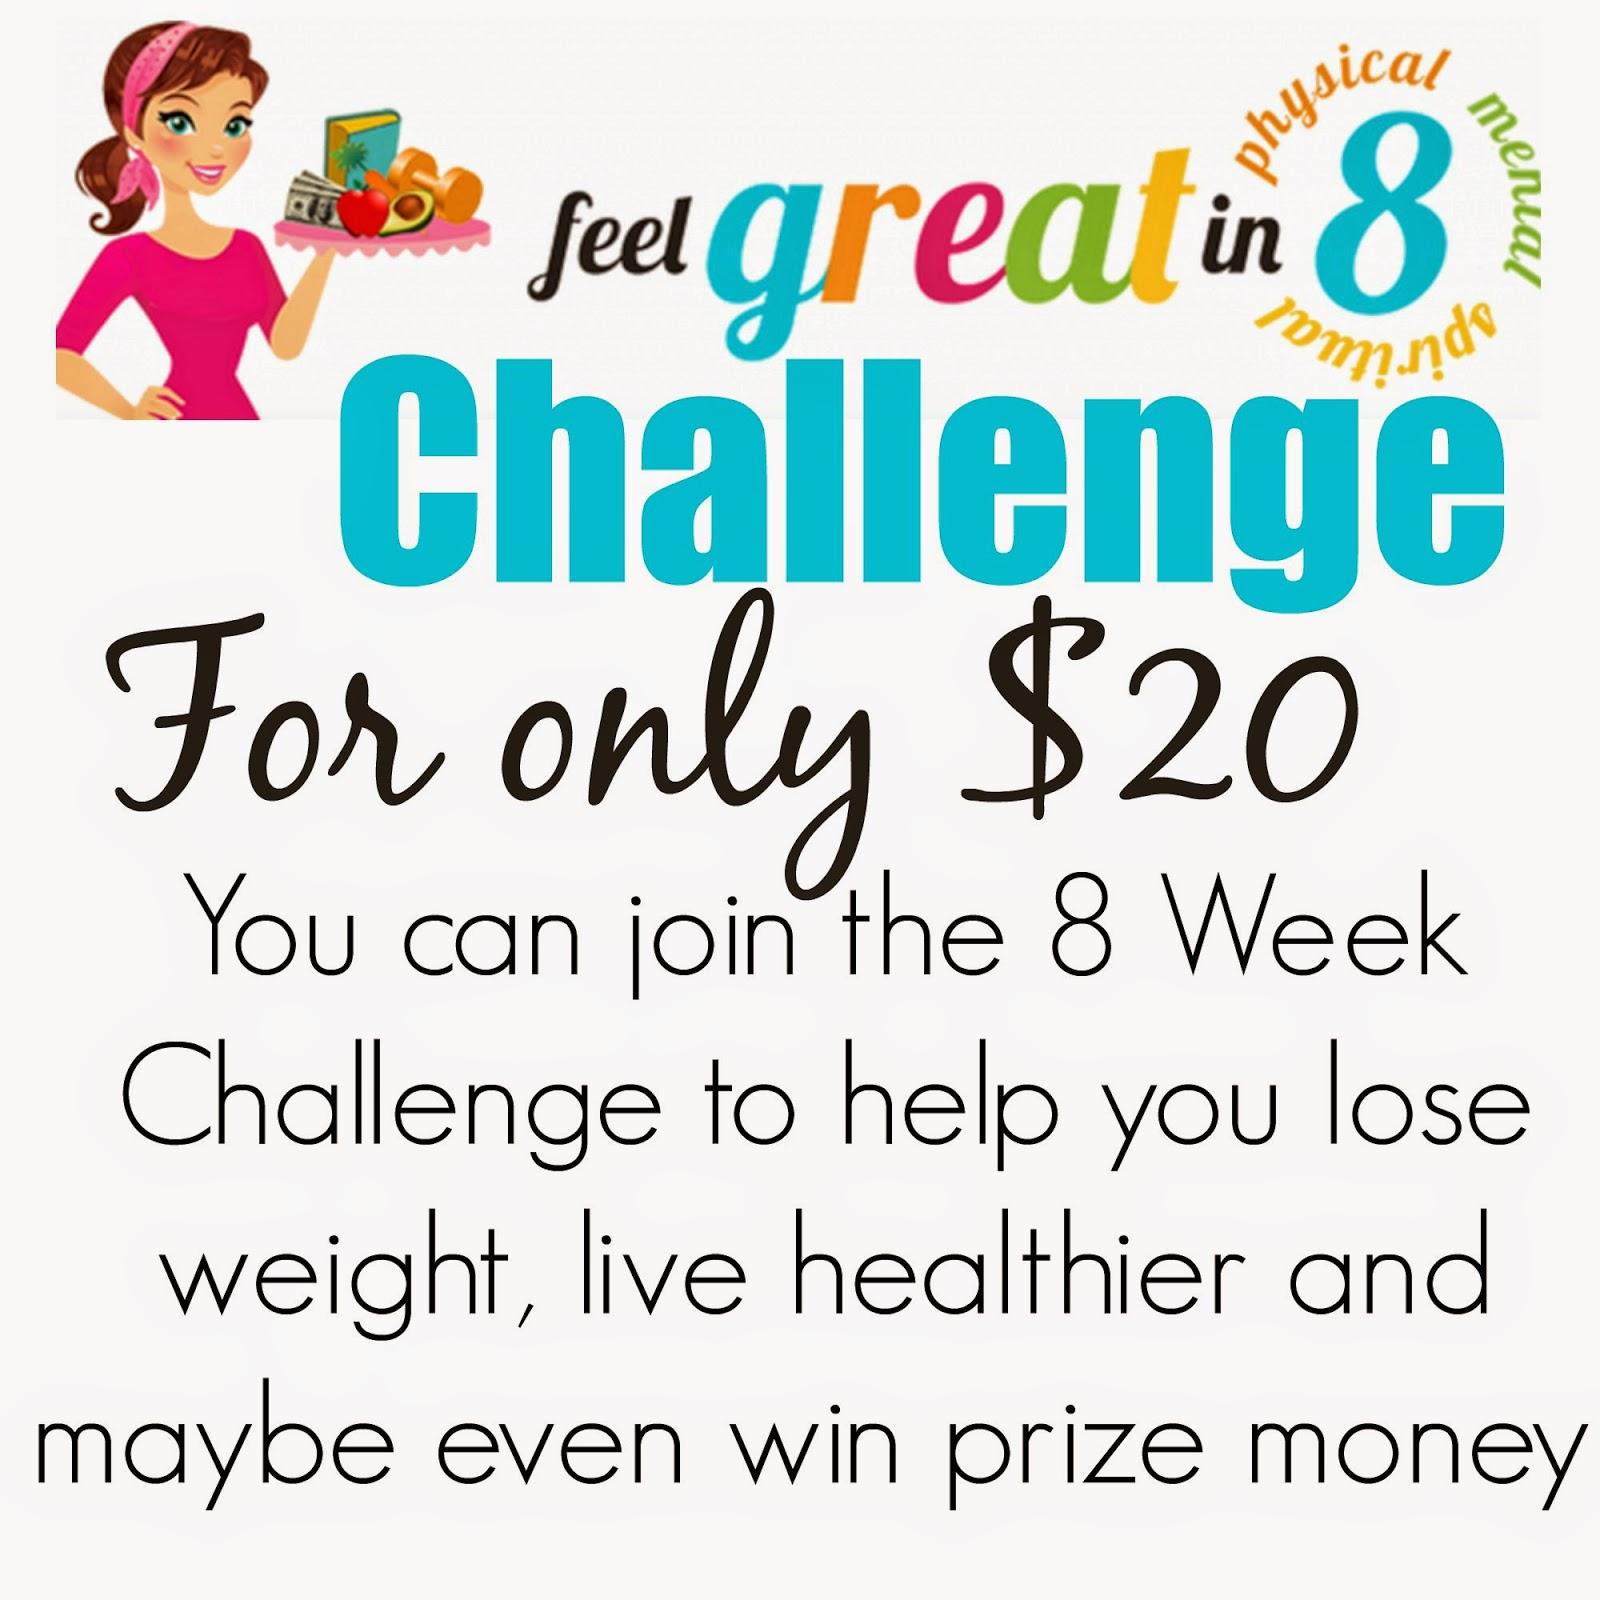 Today's Taste: 8 Week Weightloss Challenge!